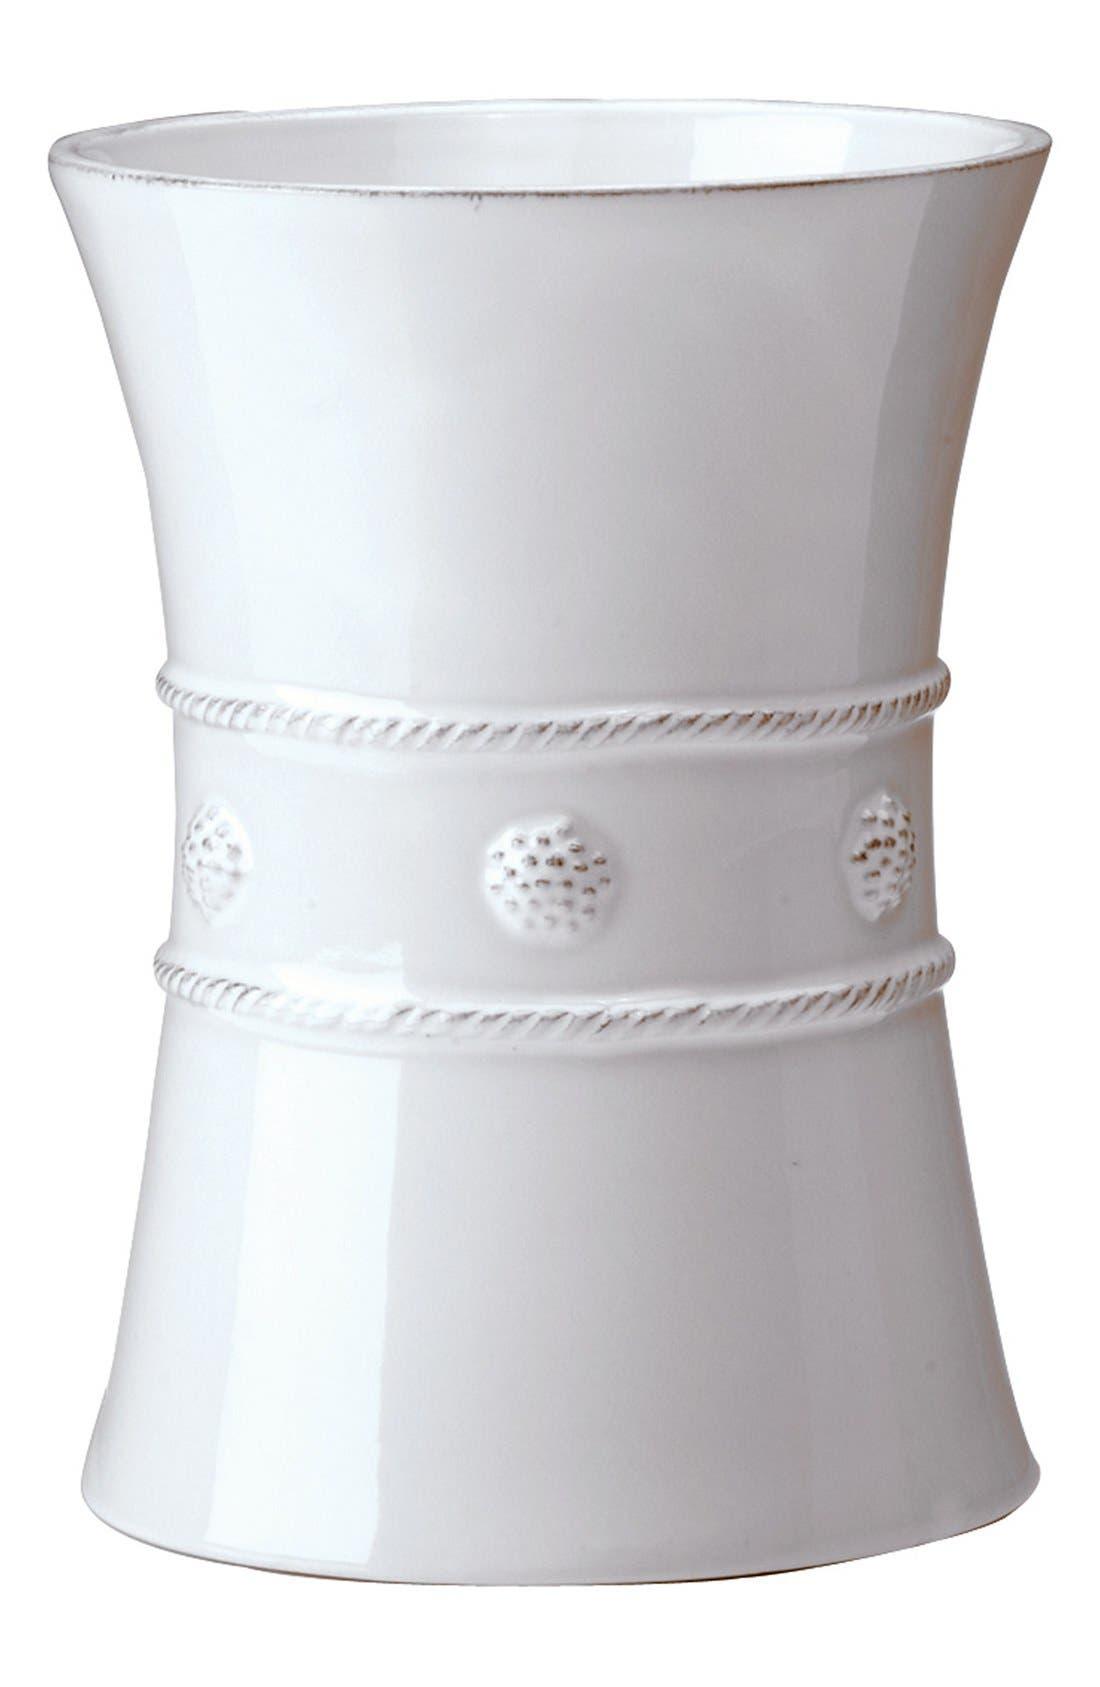 Juliska'Berry and Thread' Ceramic Utensil Crock